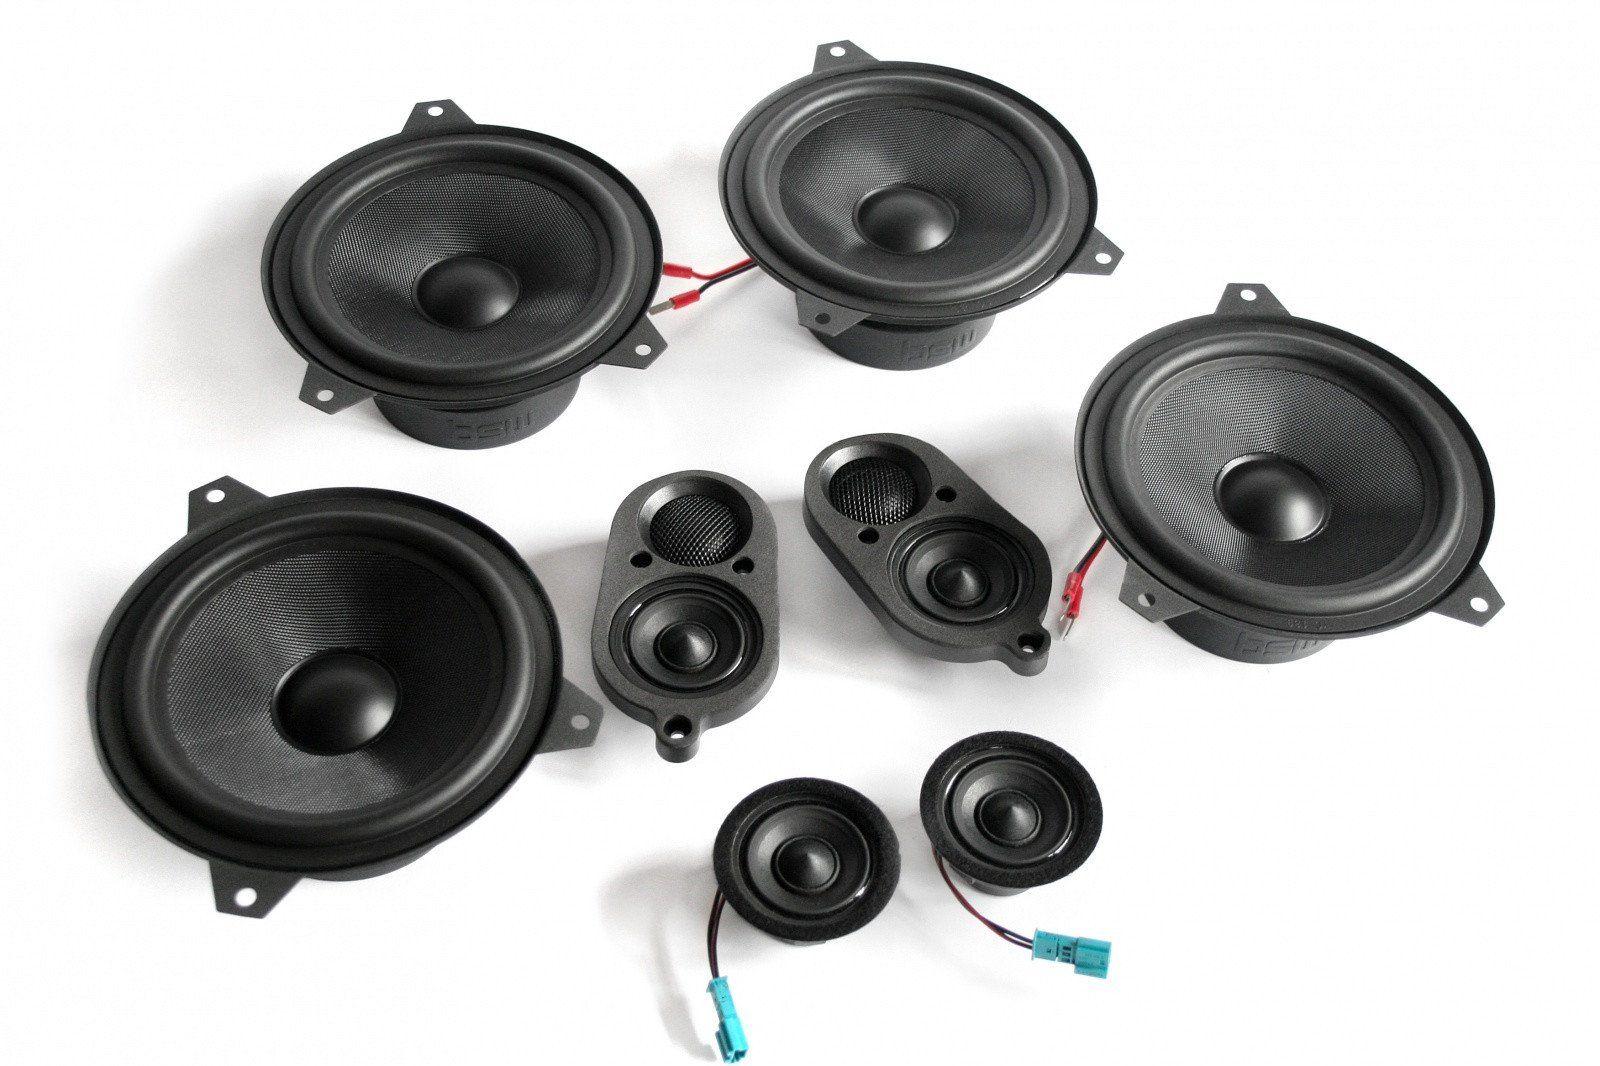 Bmw Speaker Upgrade For E46 Coupe With Harman Kardon Bmw Bmw E46 E46 Coupe